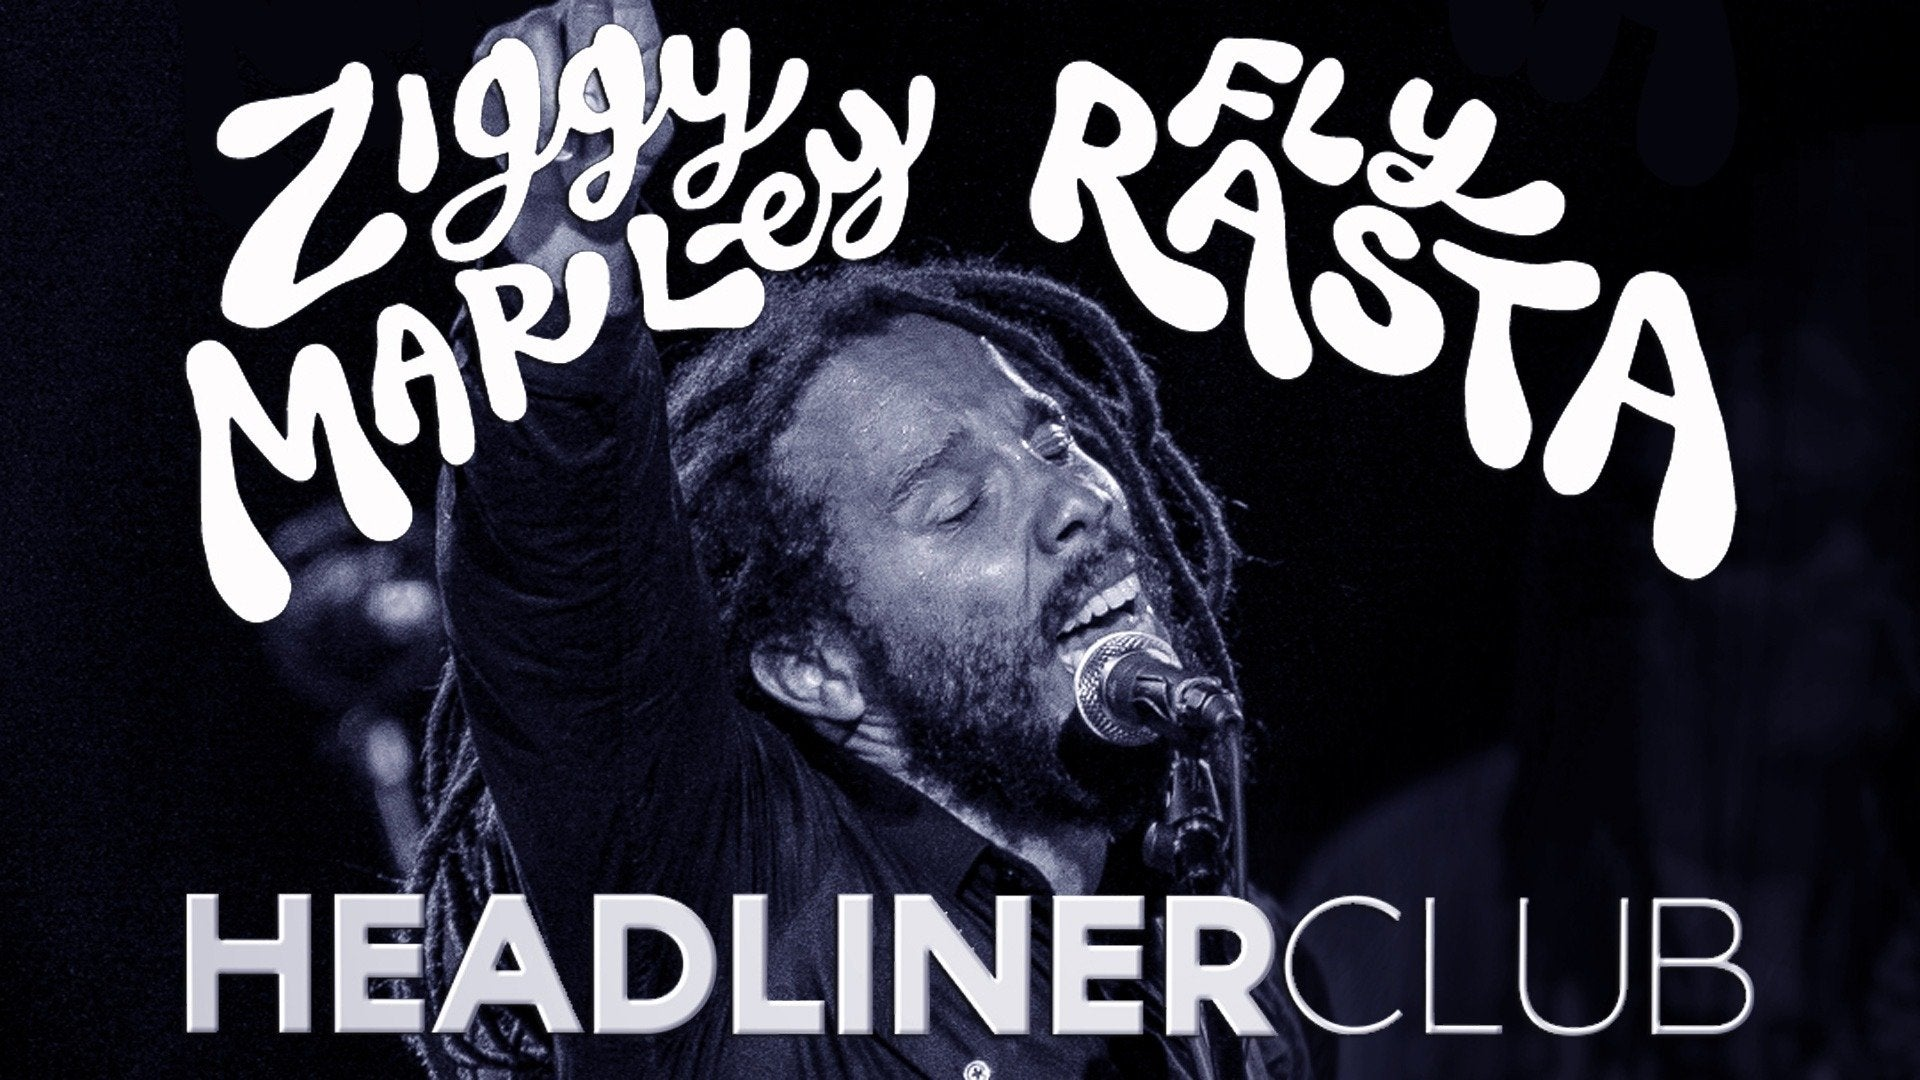 Ziggy Marley: Fly Rasta: Headliner Club